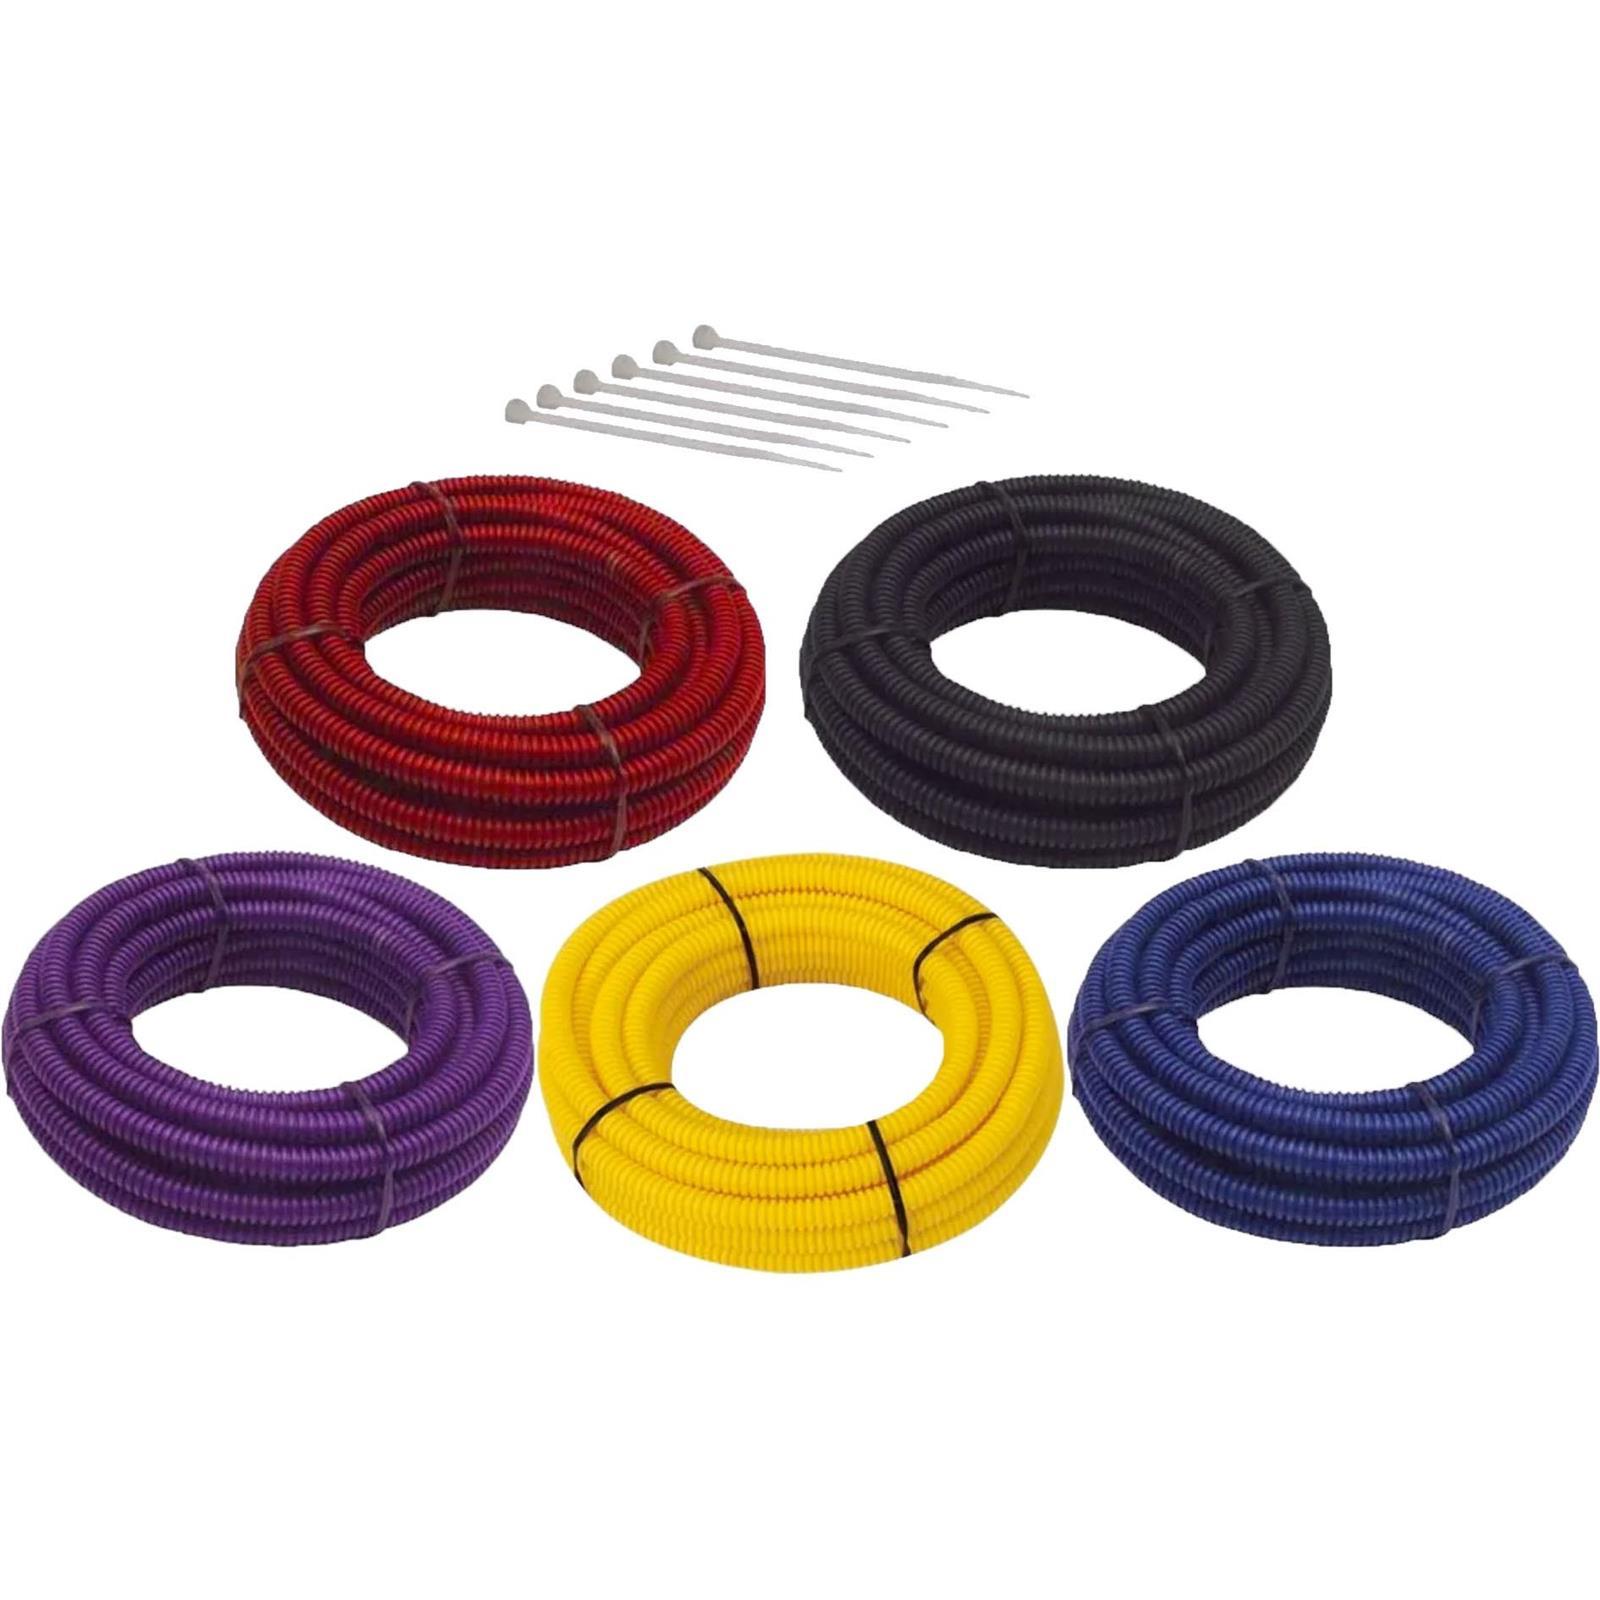 Split Wire Loom Conduit Tubing, 3/8 Inch Diameter, 12 Ft. LongSpeedway Motors